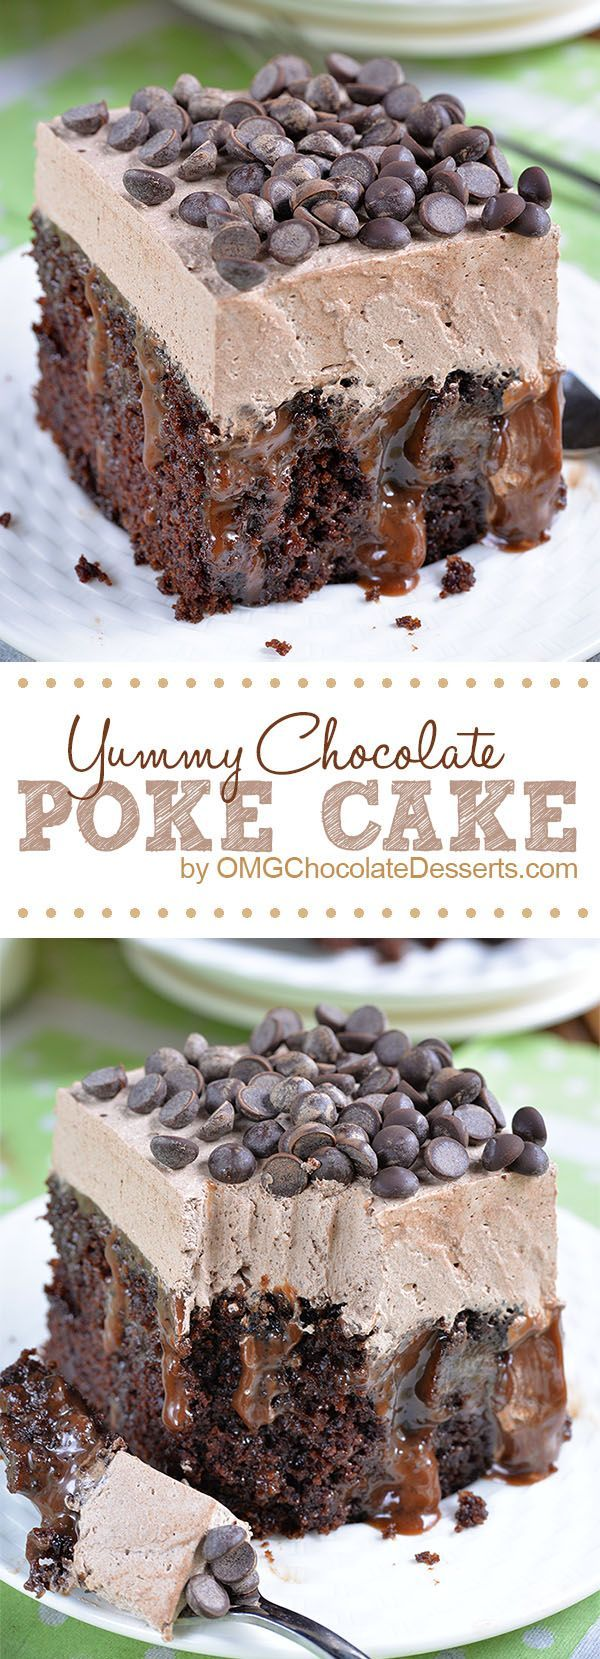 Chocolate Poke Cake #chocolatecake